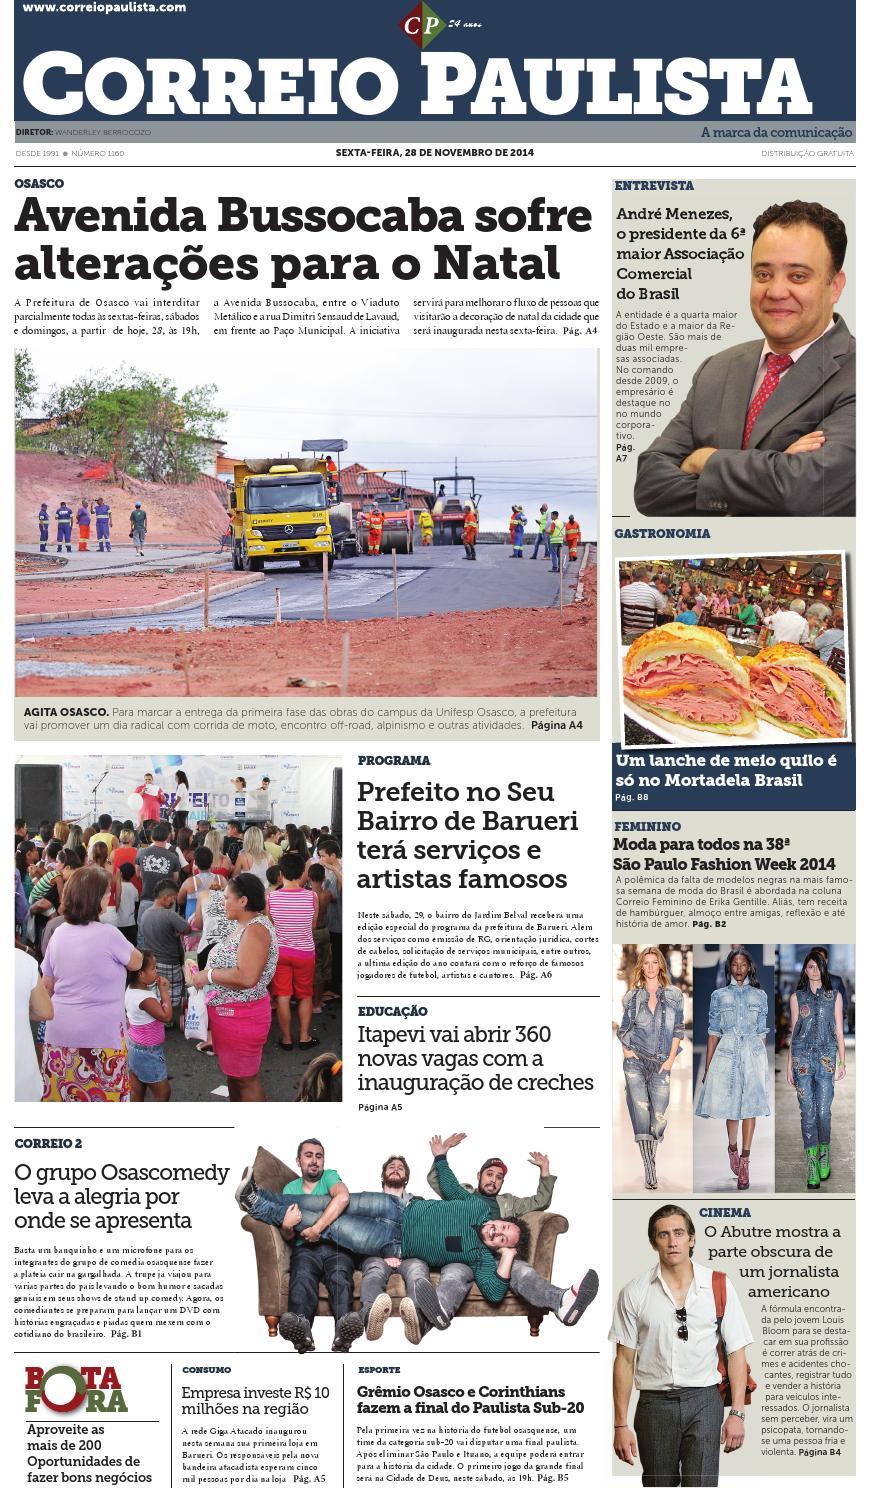 68a1b44fac699 jornal Correio Paulista 1160 by Jornal Correio Paulista - issuu